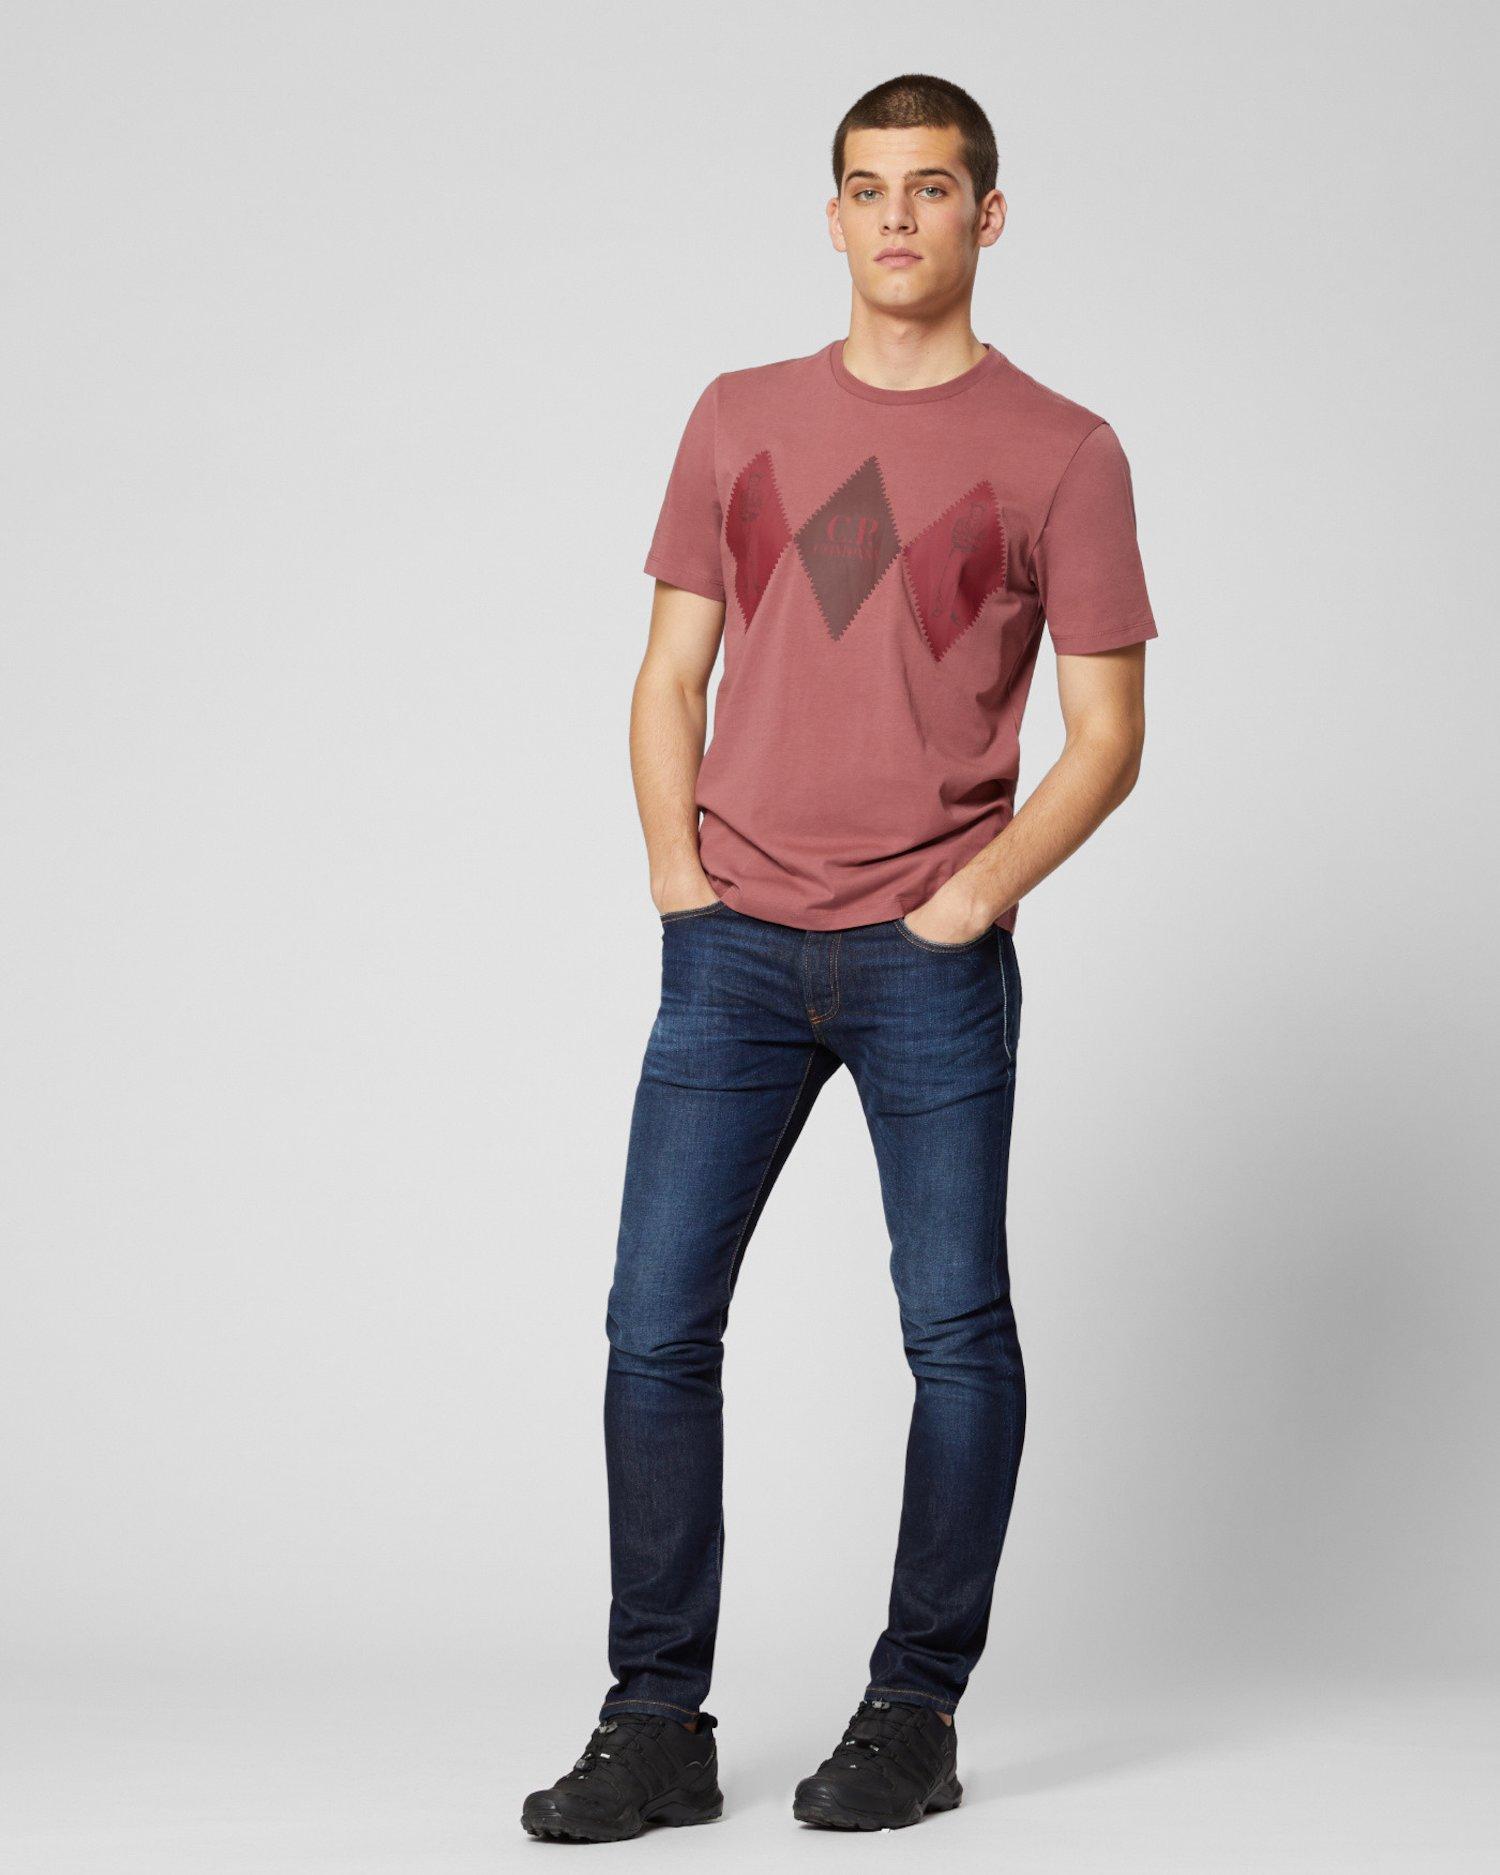 Jersey 30/1 Diamonds Front T-Shirt